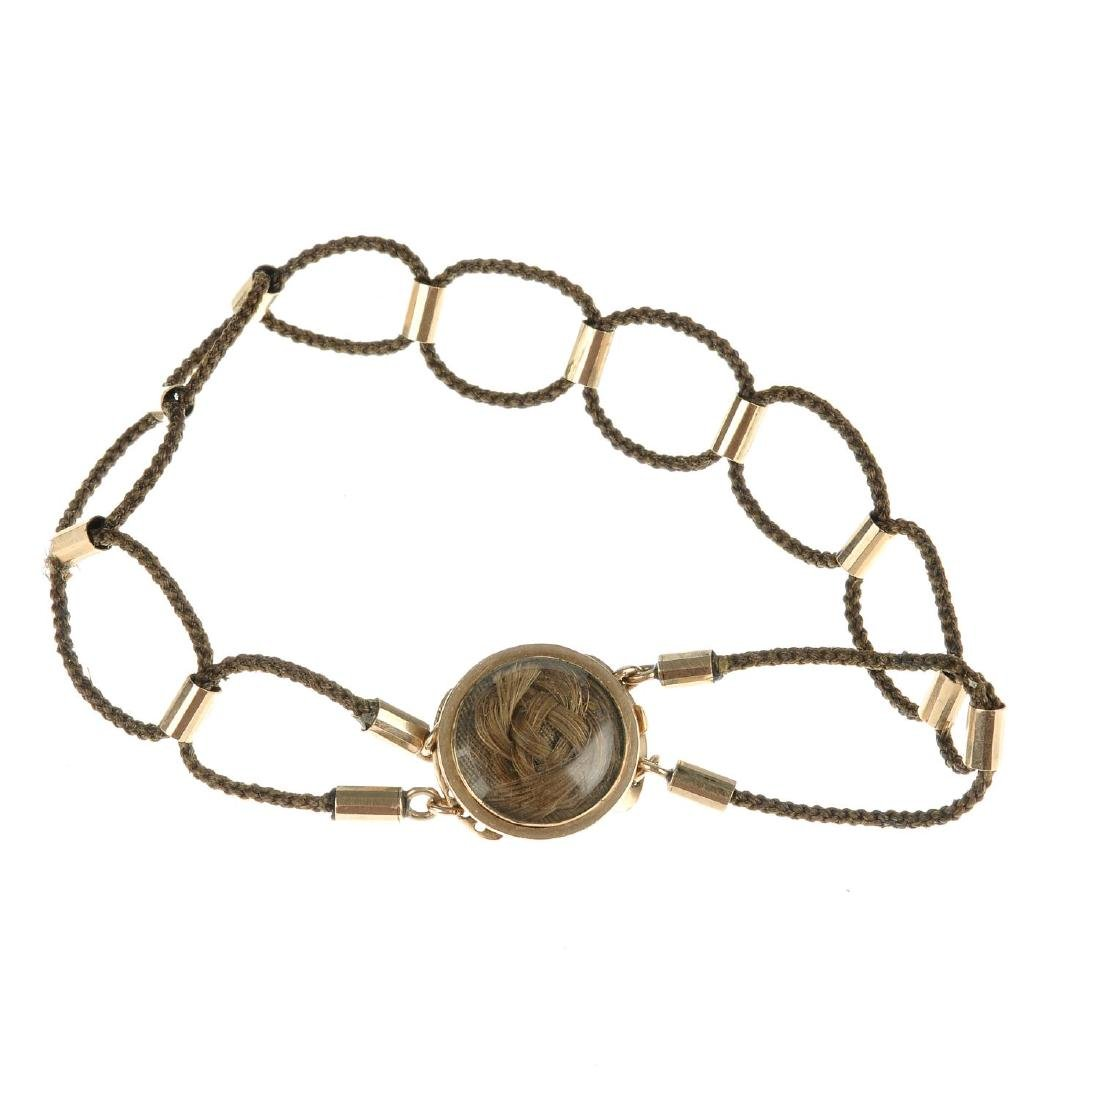 A late Victorian hair memorial bracelet. Of circular